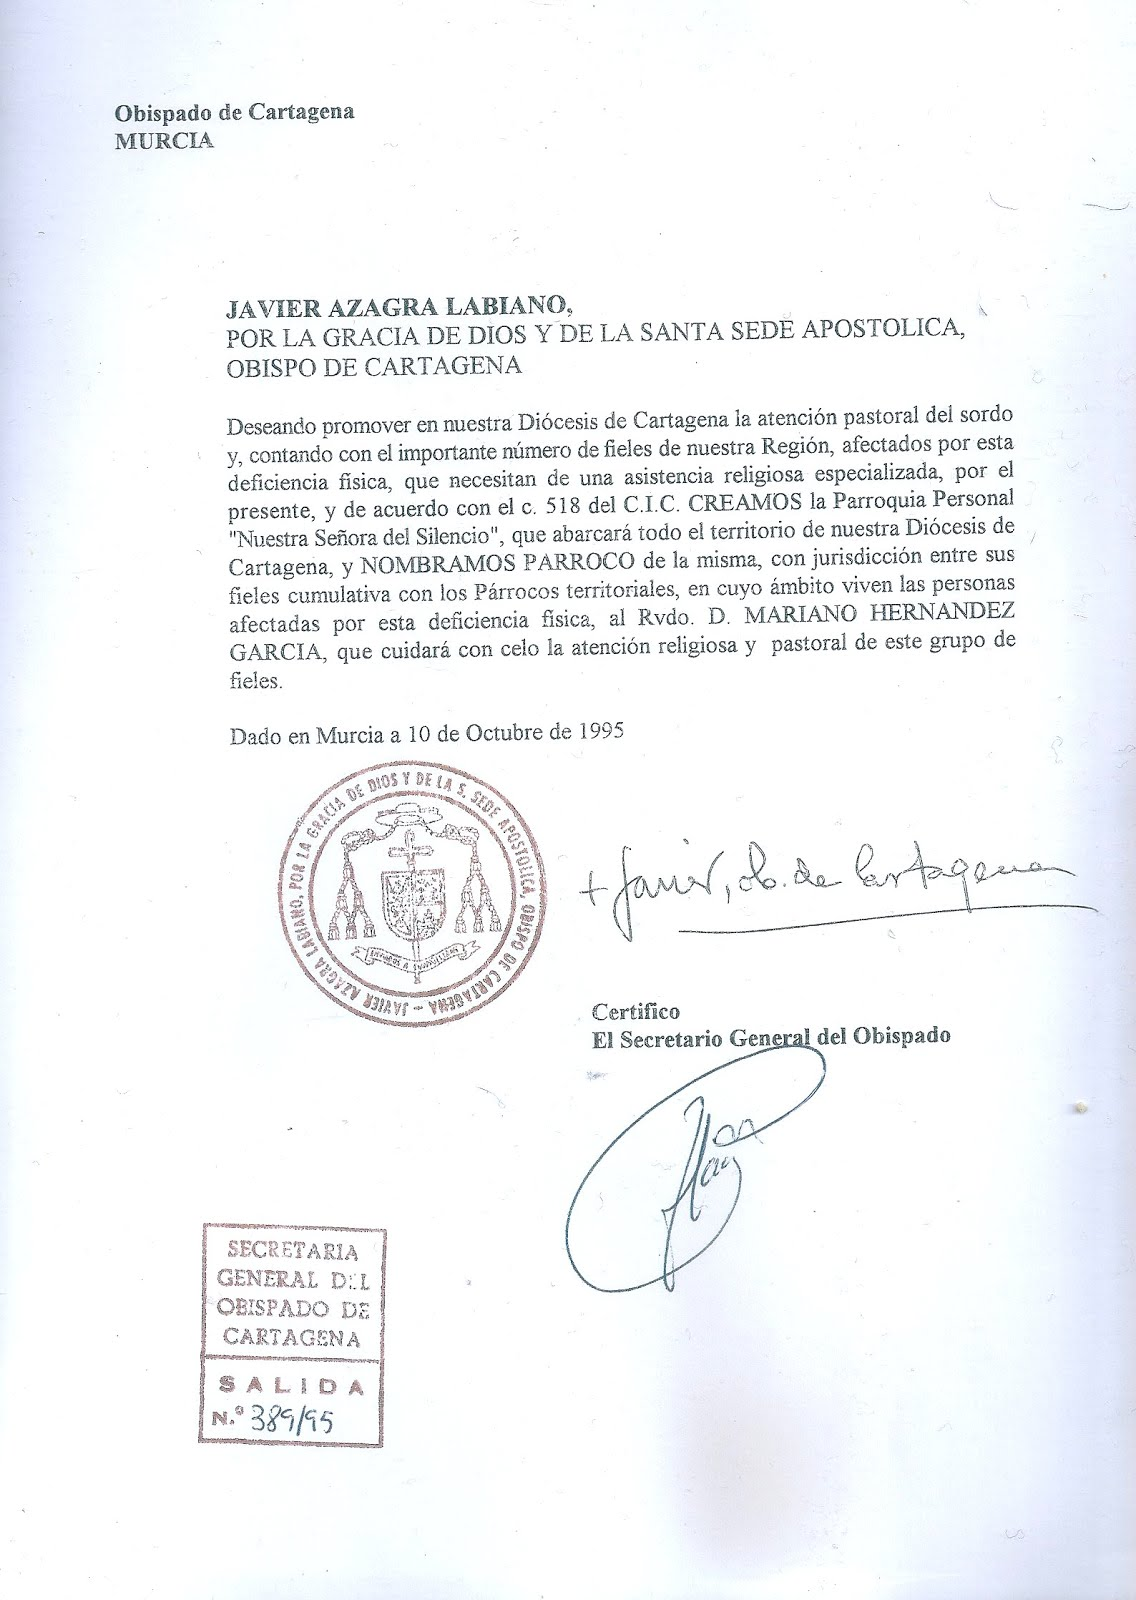 PARROQUIA PERSONAL DE SORDOS